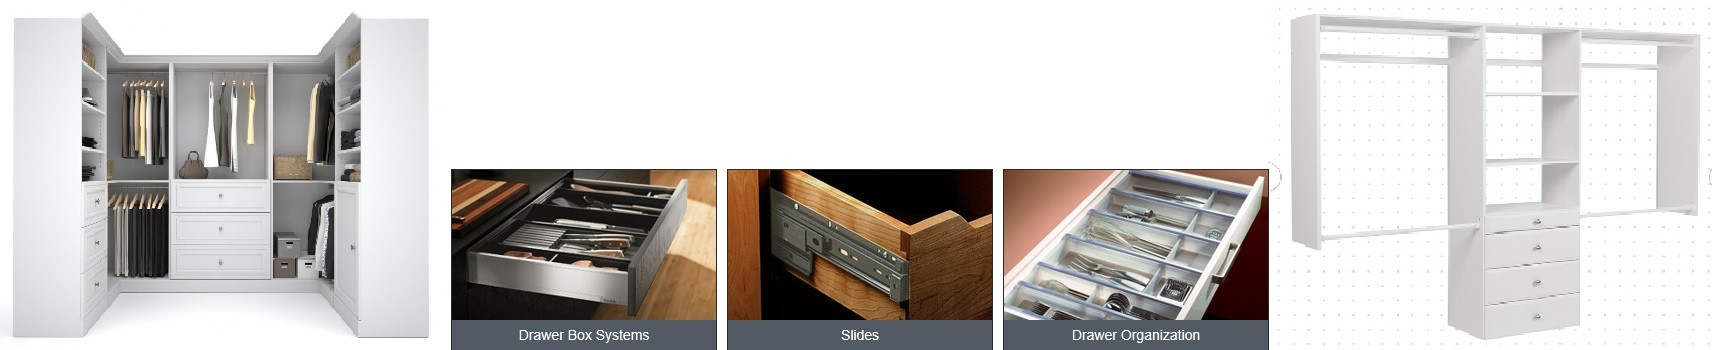 Custom Closet Organizer Wardrobe in Canada | Furnitureandpatio